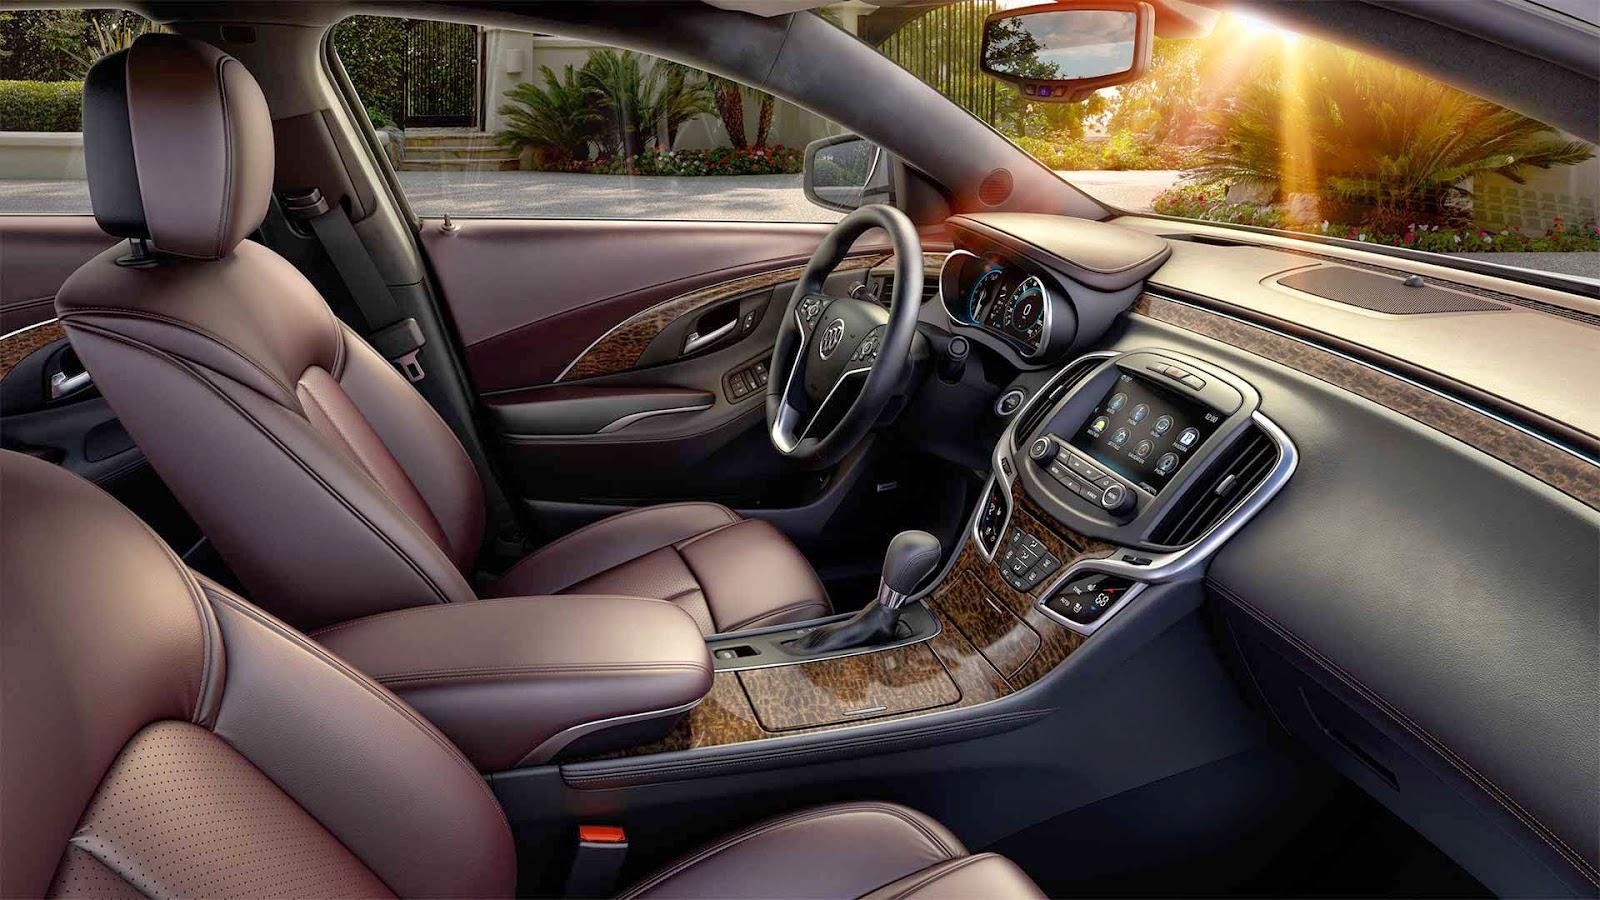 2014 Buick Lacrosse S Ultra Luxury Interior Moves Fashion Forward Okotoks Gm